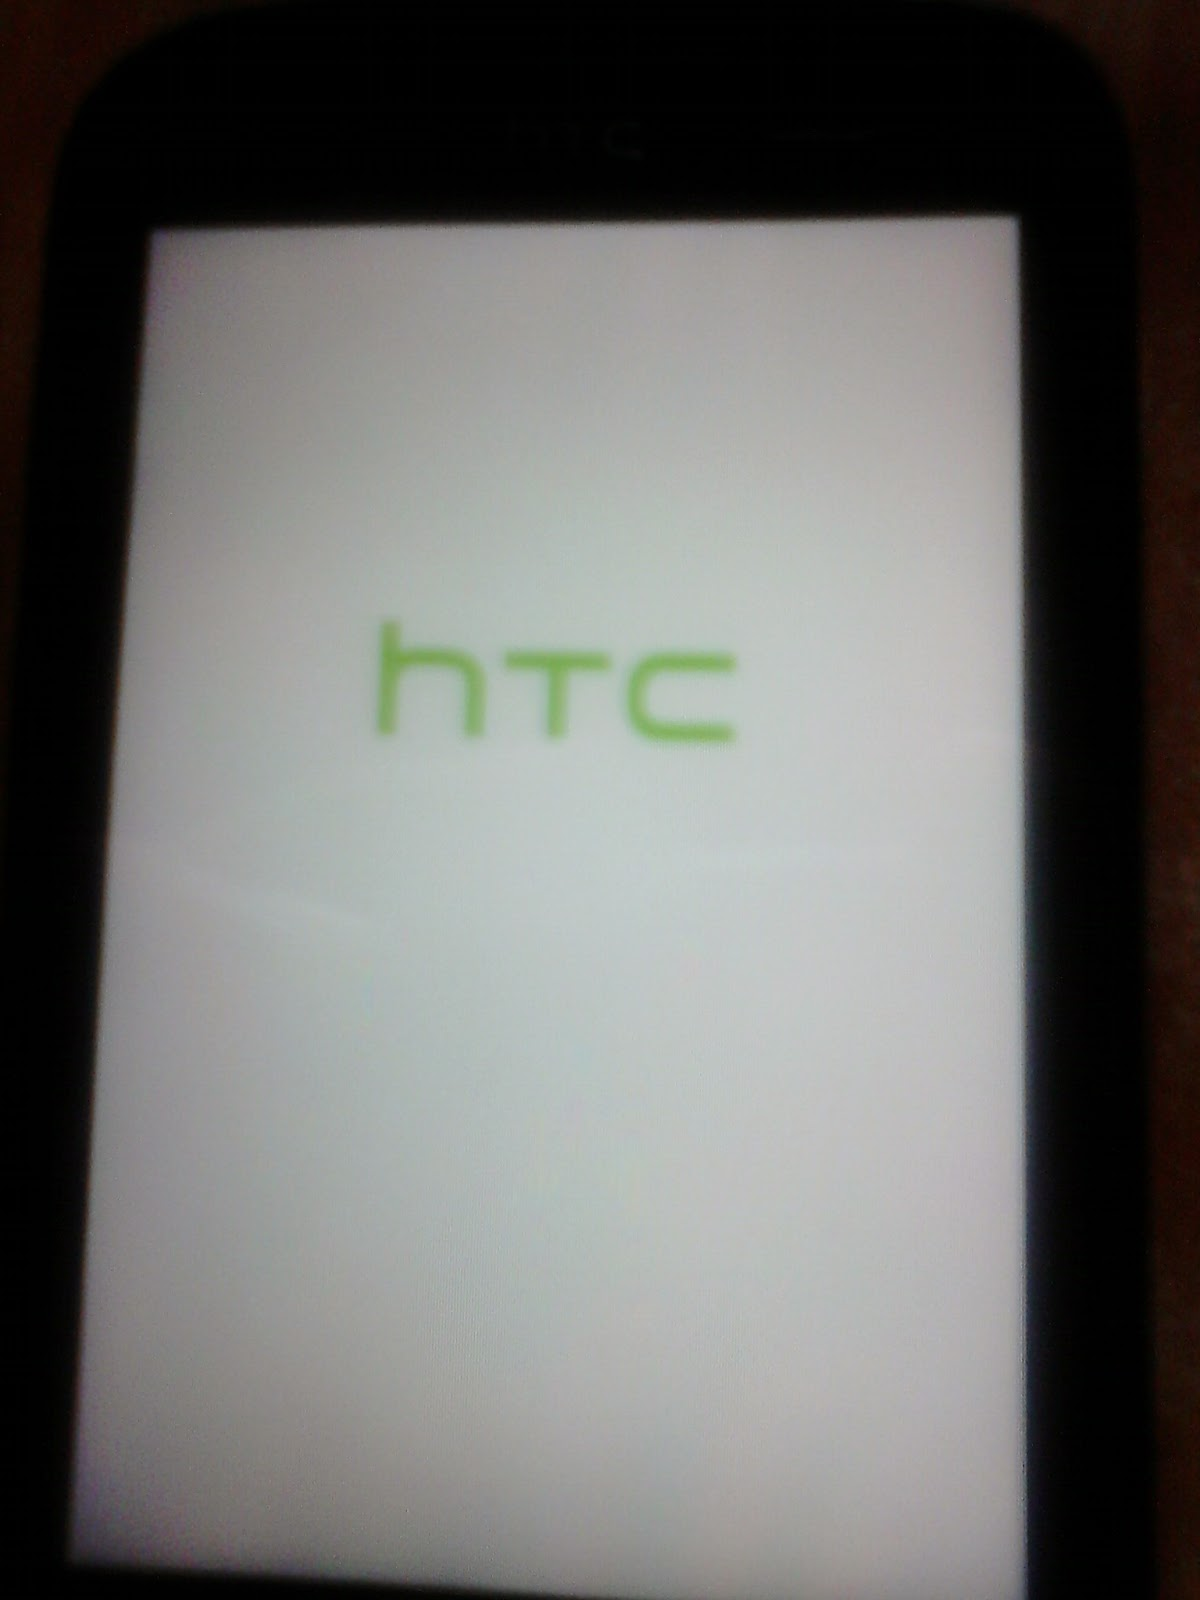 know jugaad stuck on white htc logo screen